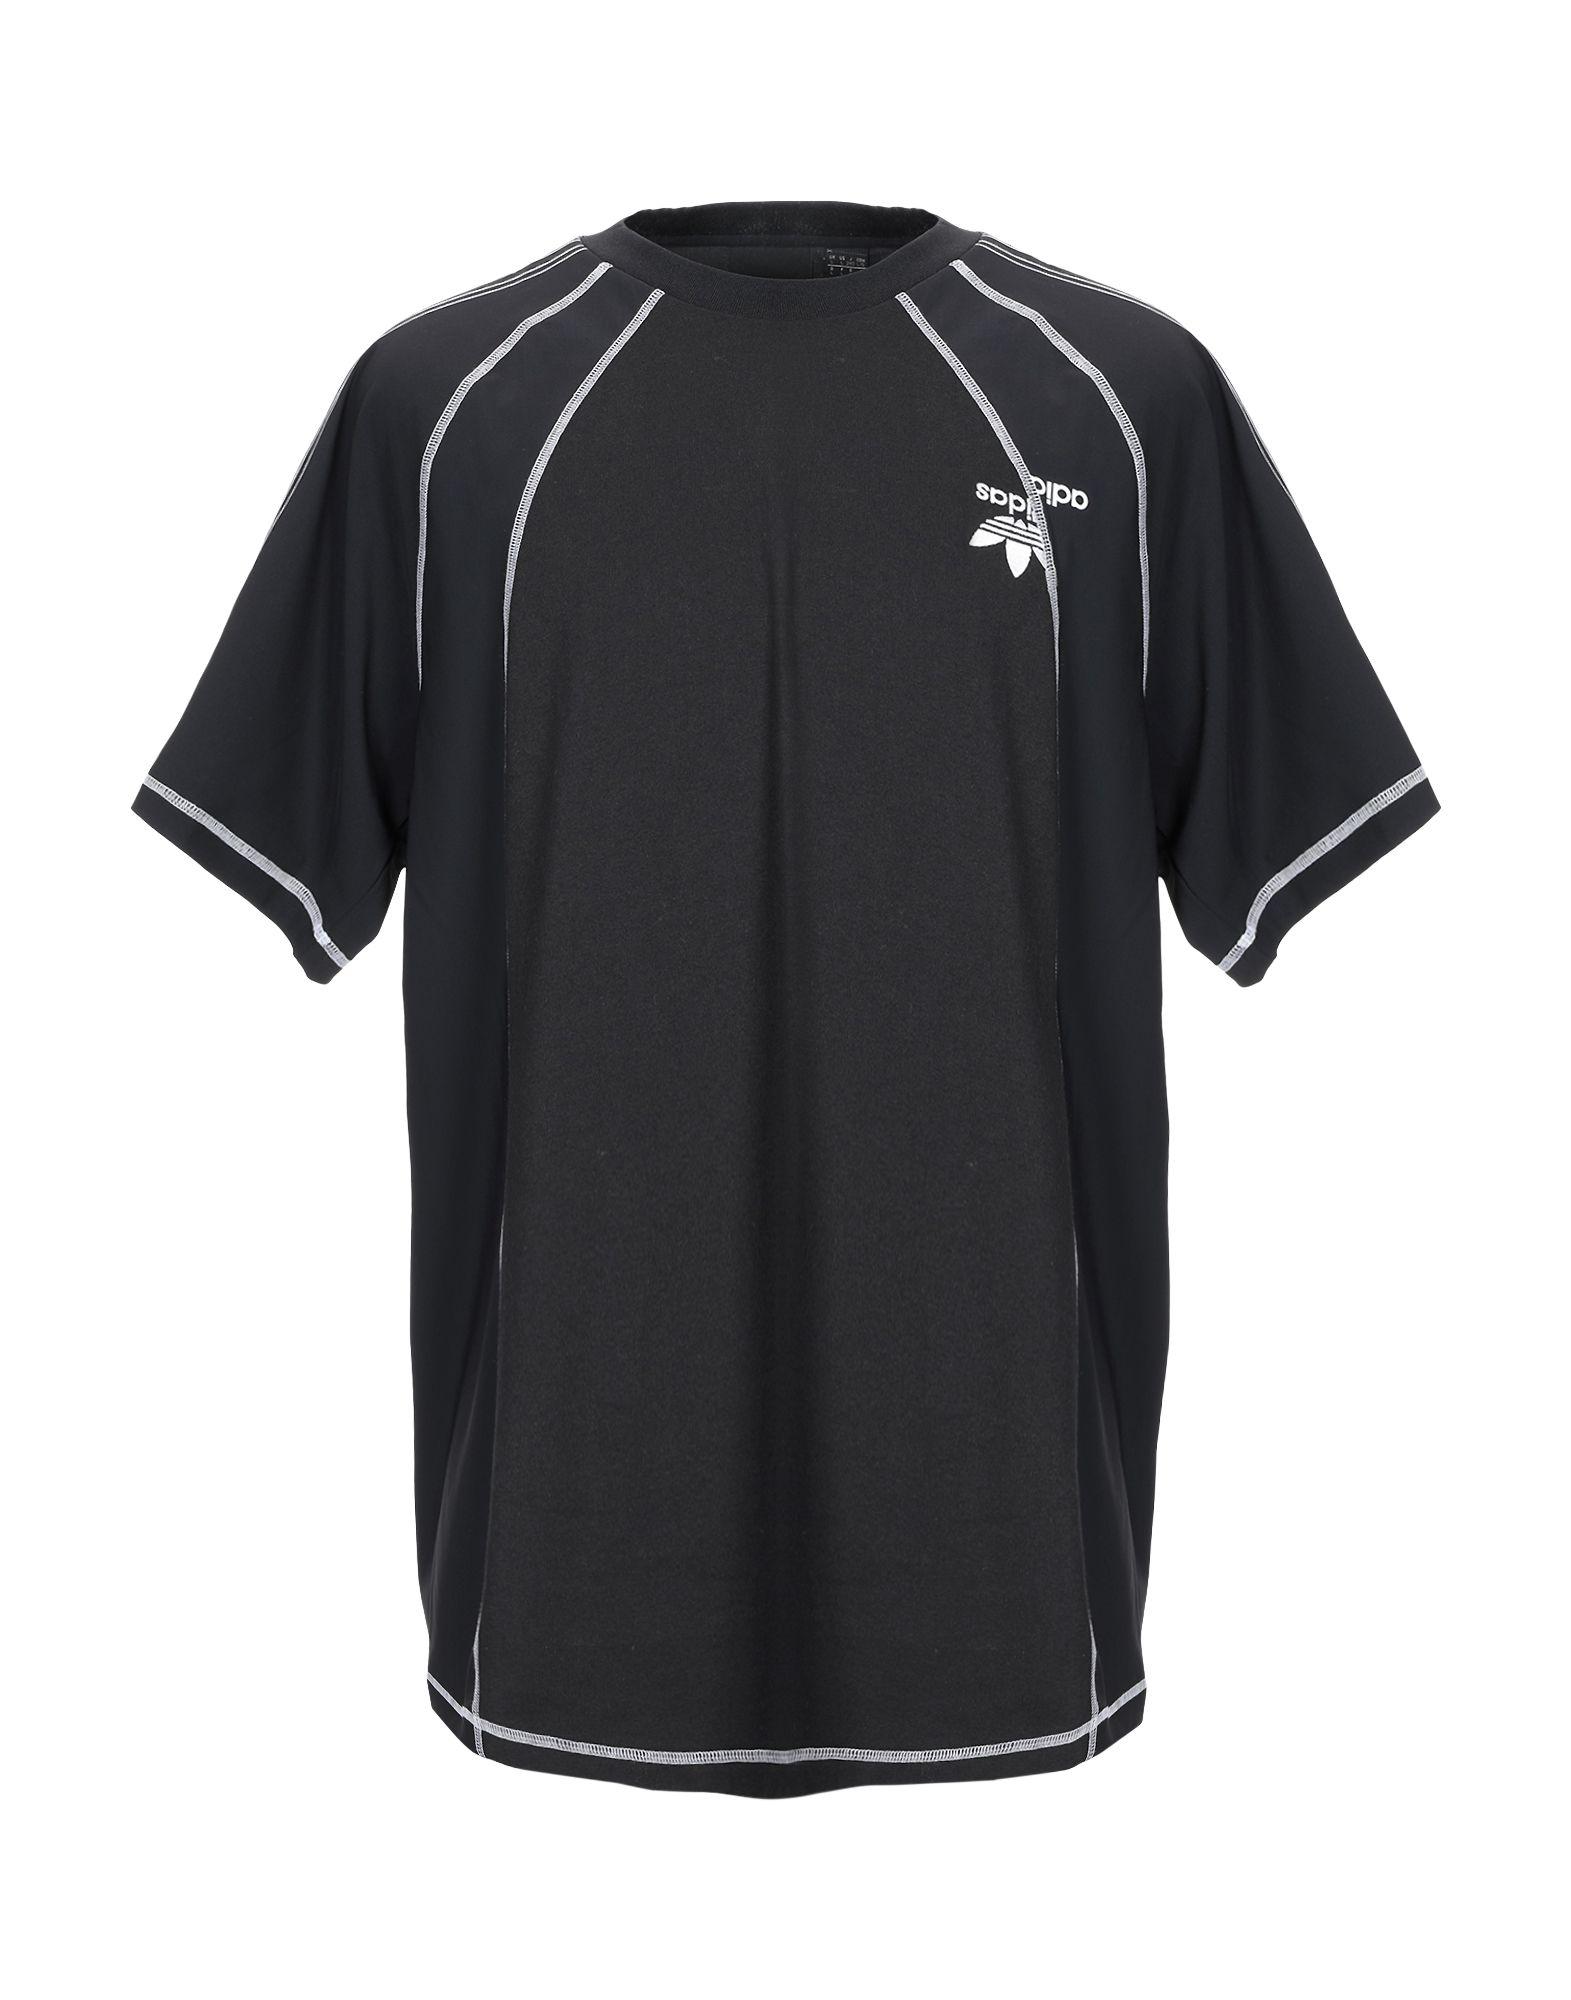 ADIDAS ORIGINALS by ALEXANDER WANG Футболка adidas originals футболка